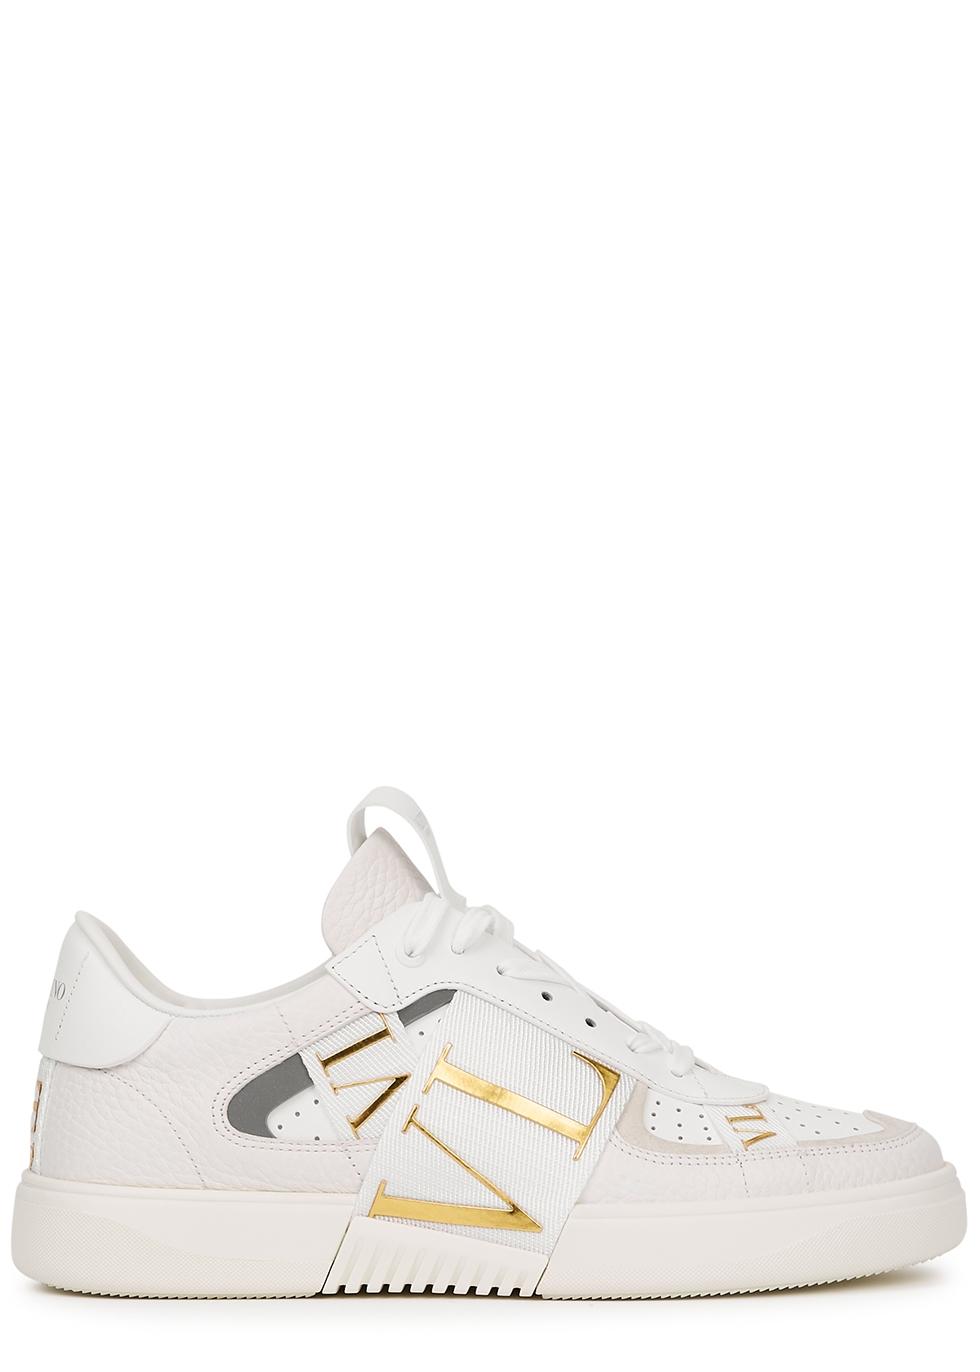 Valentino Garavani VL7N panelled leather sneakers